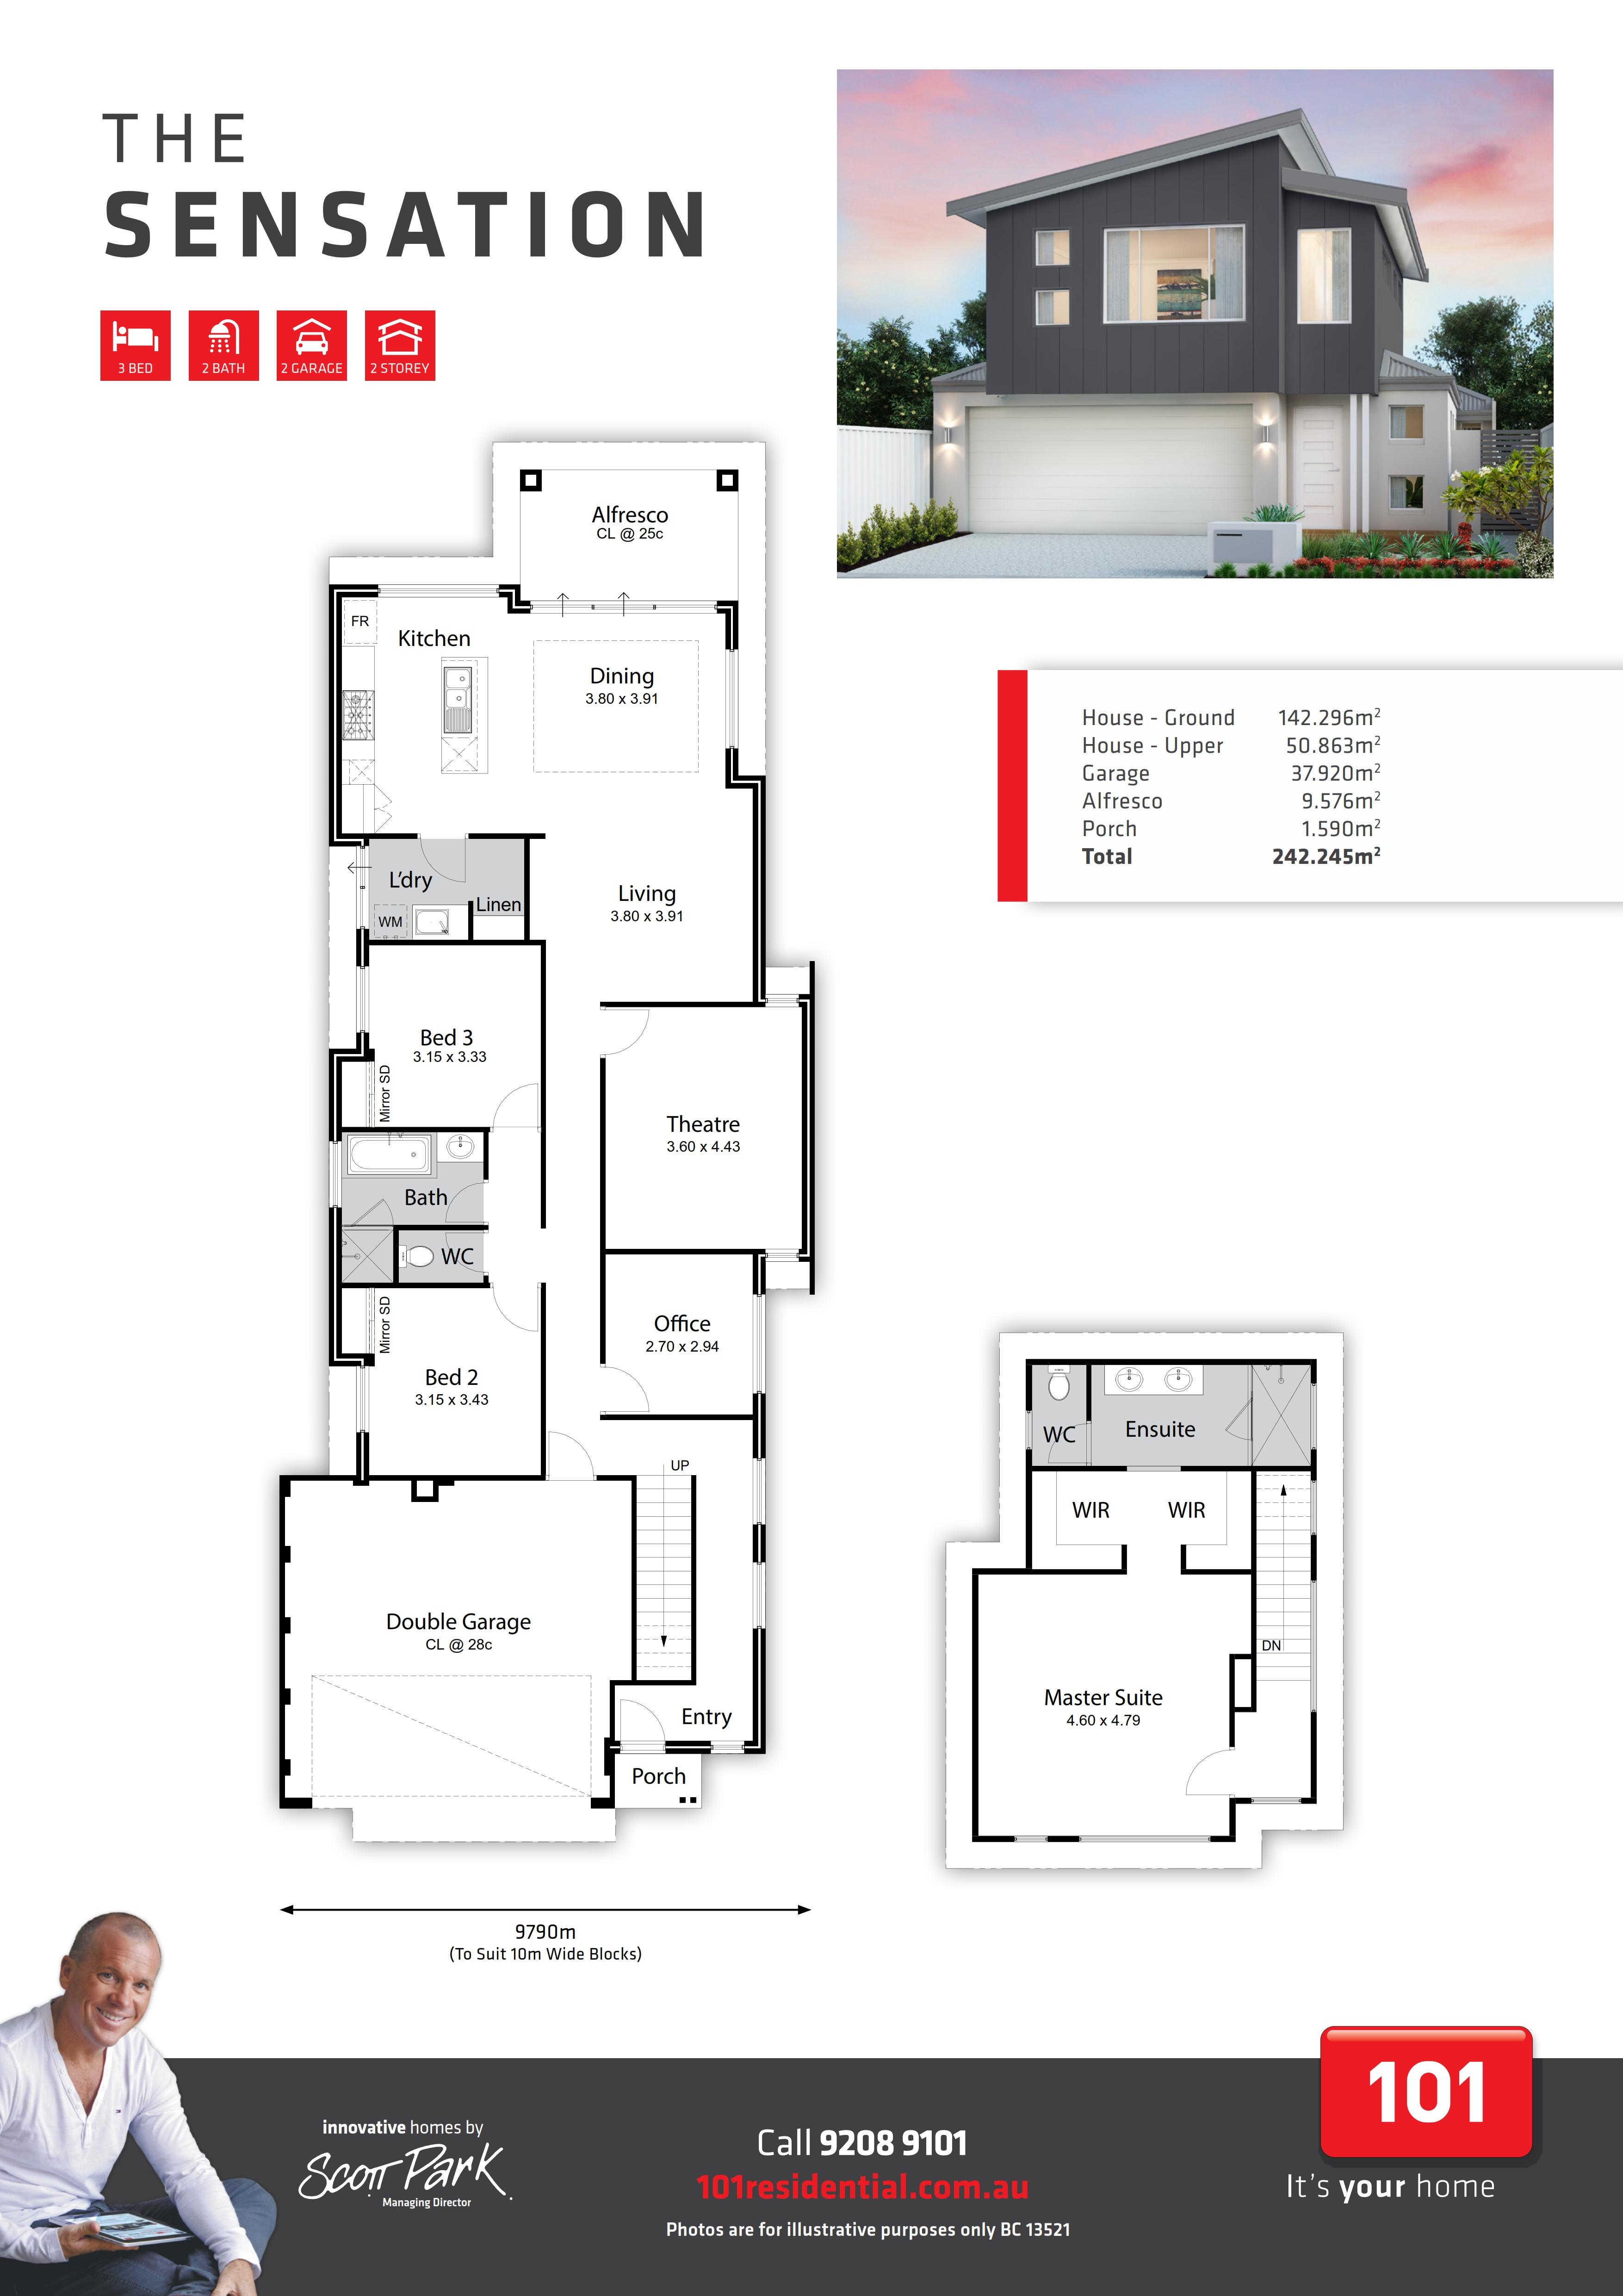 101 A3 Floor Plan - Sensation WEB_001